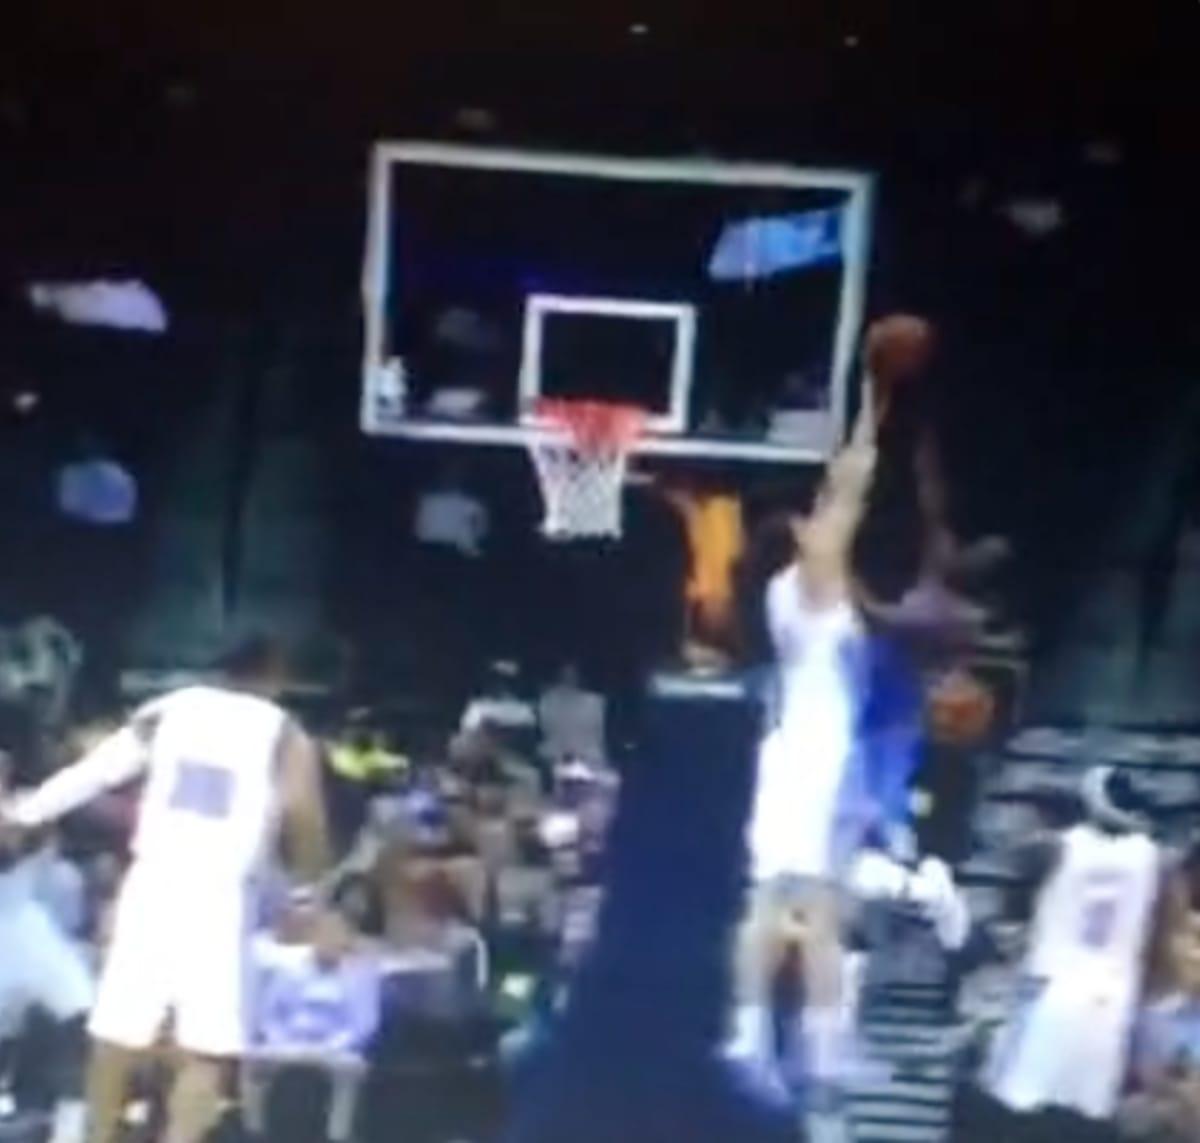 Denver Nuggets Game Tonight: Timofey Mozgov Blocks Kevin Durant (GIF)